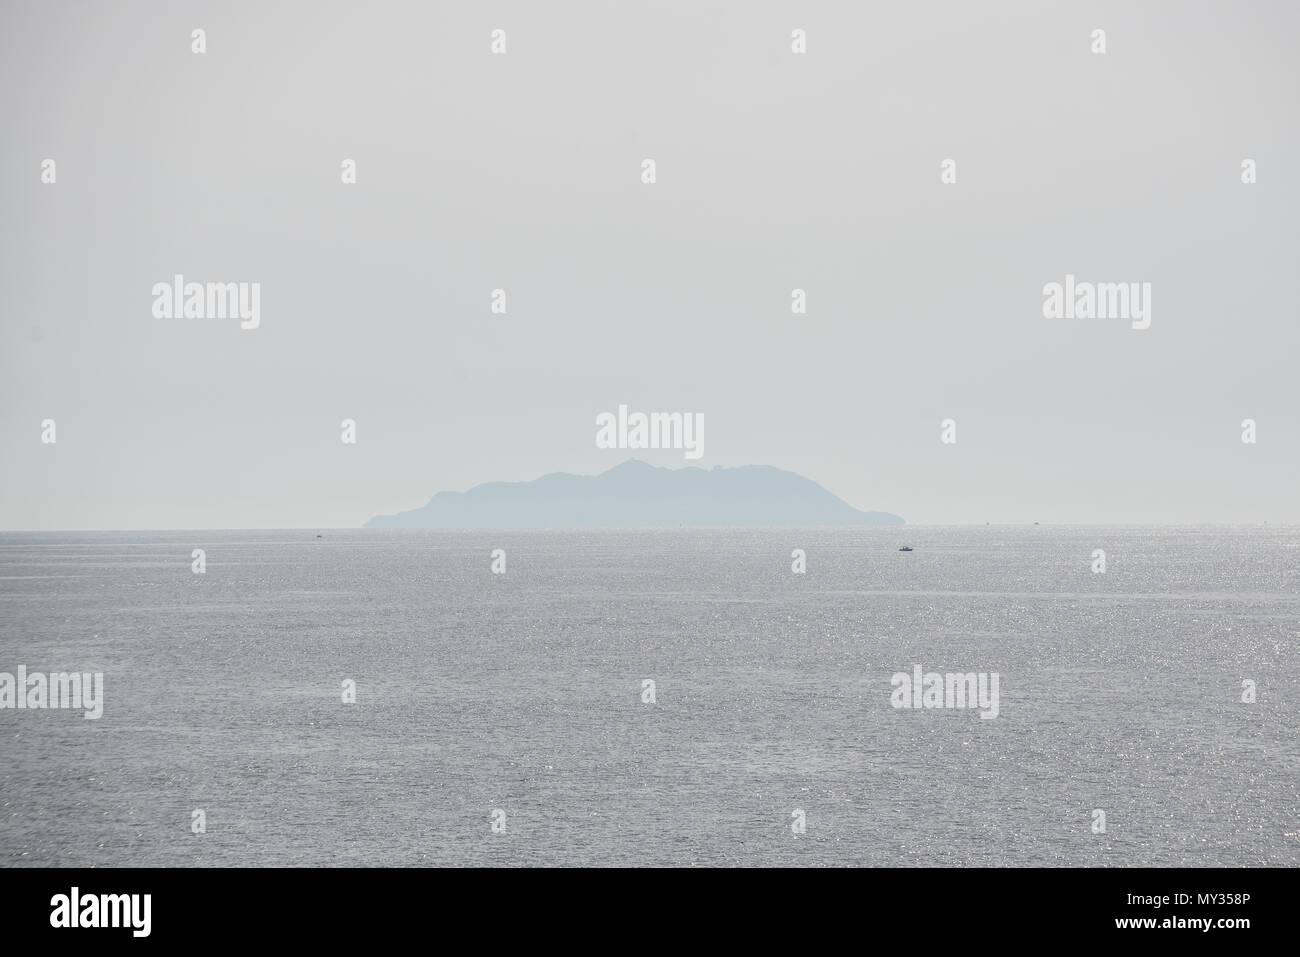 Island belonging to Arcipelago Toscano close to Livorno, Tuscany, Italy - Stock Image